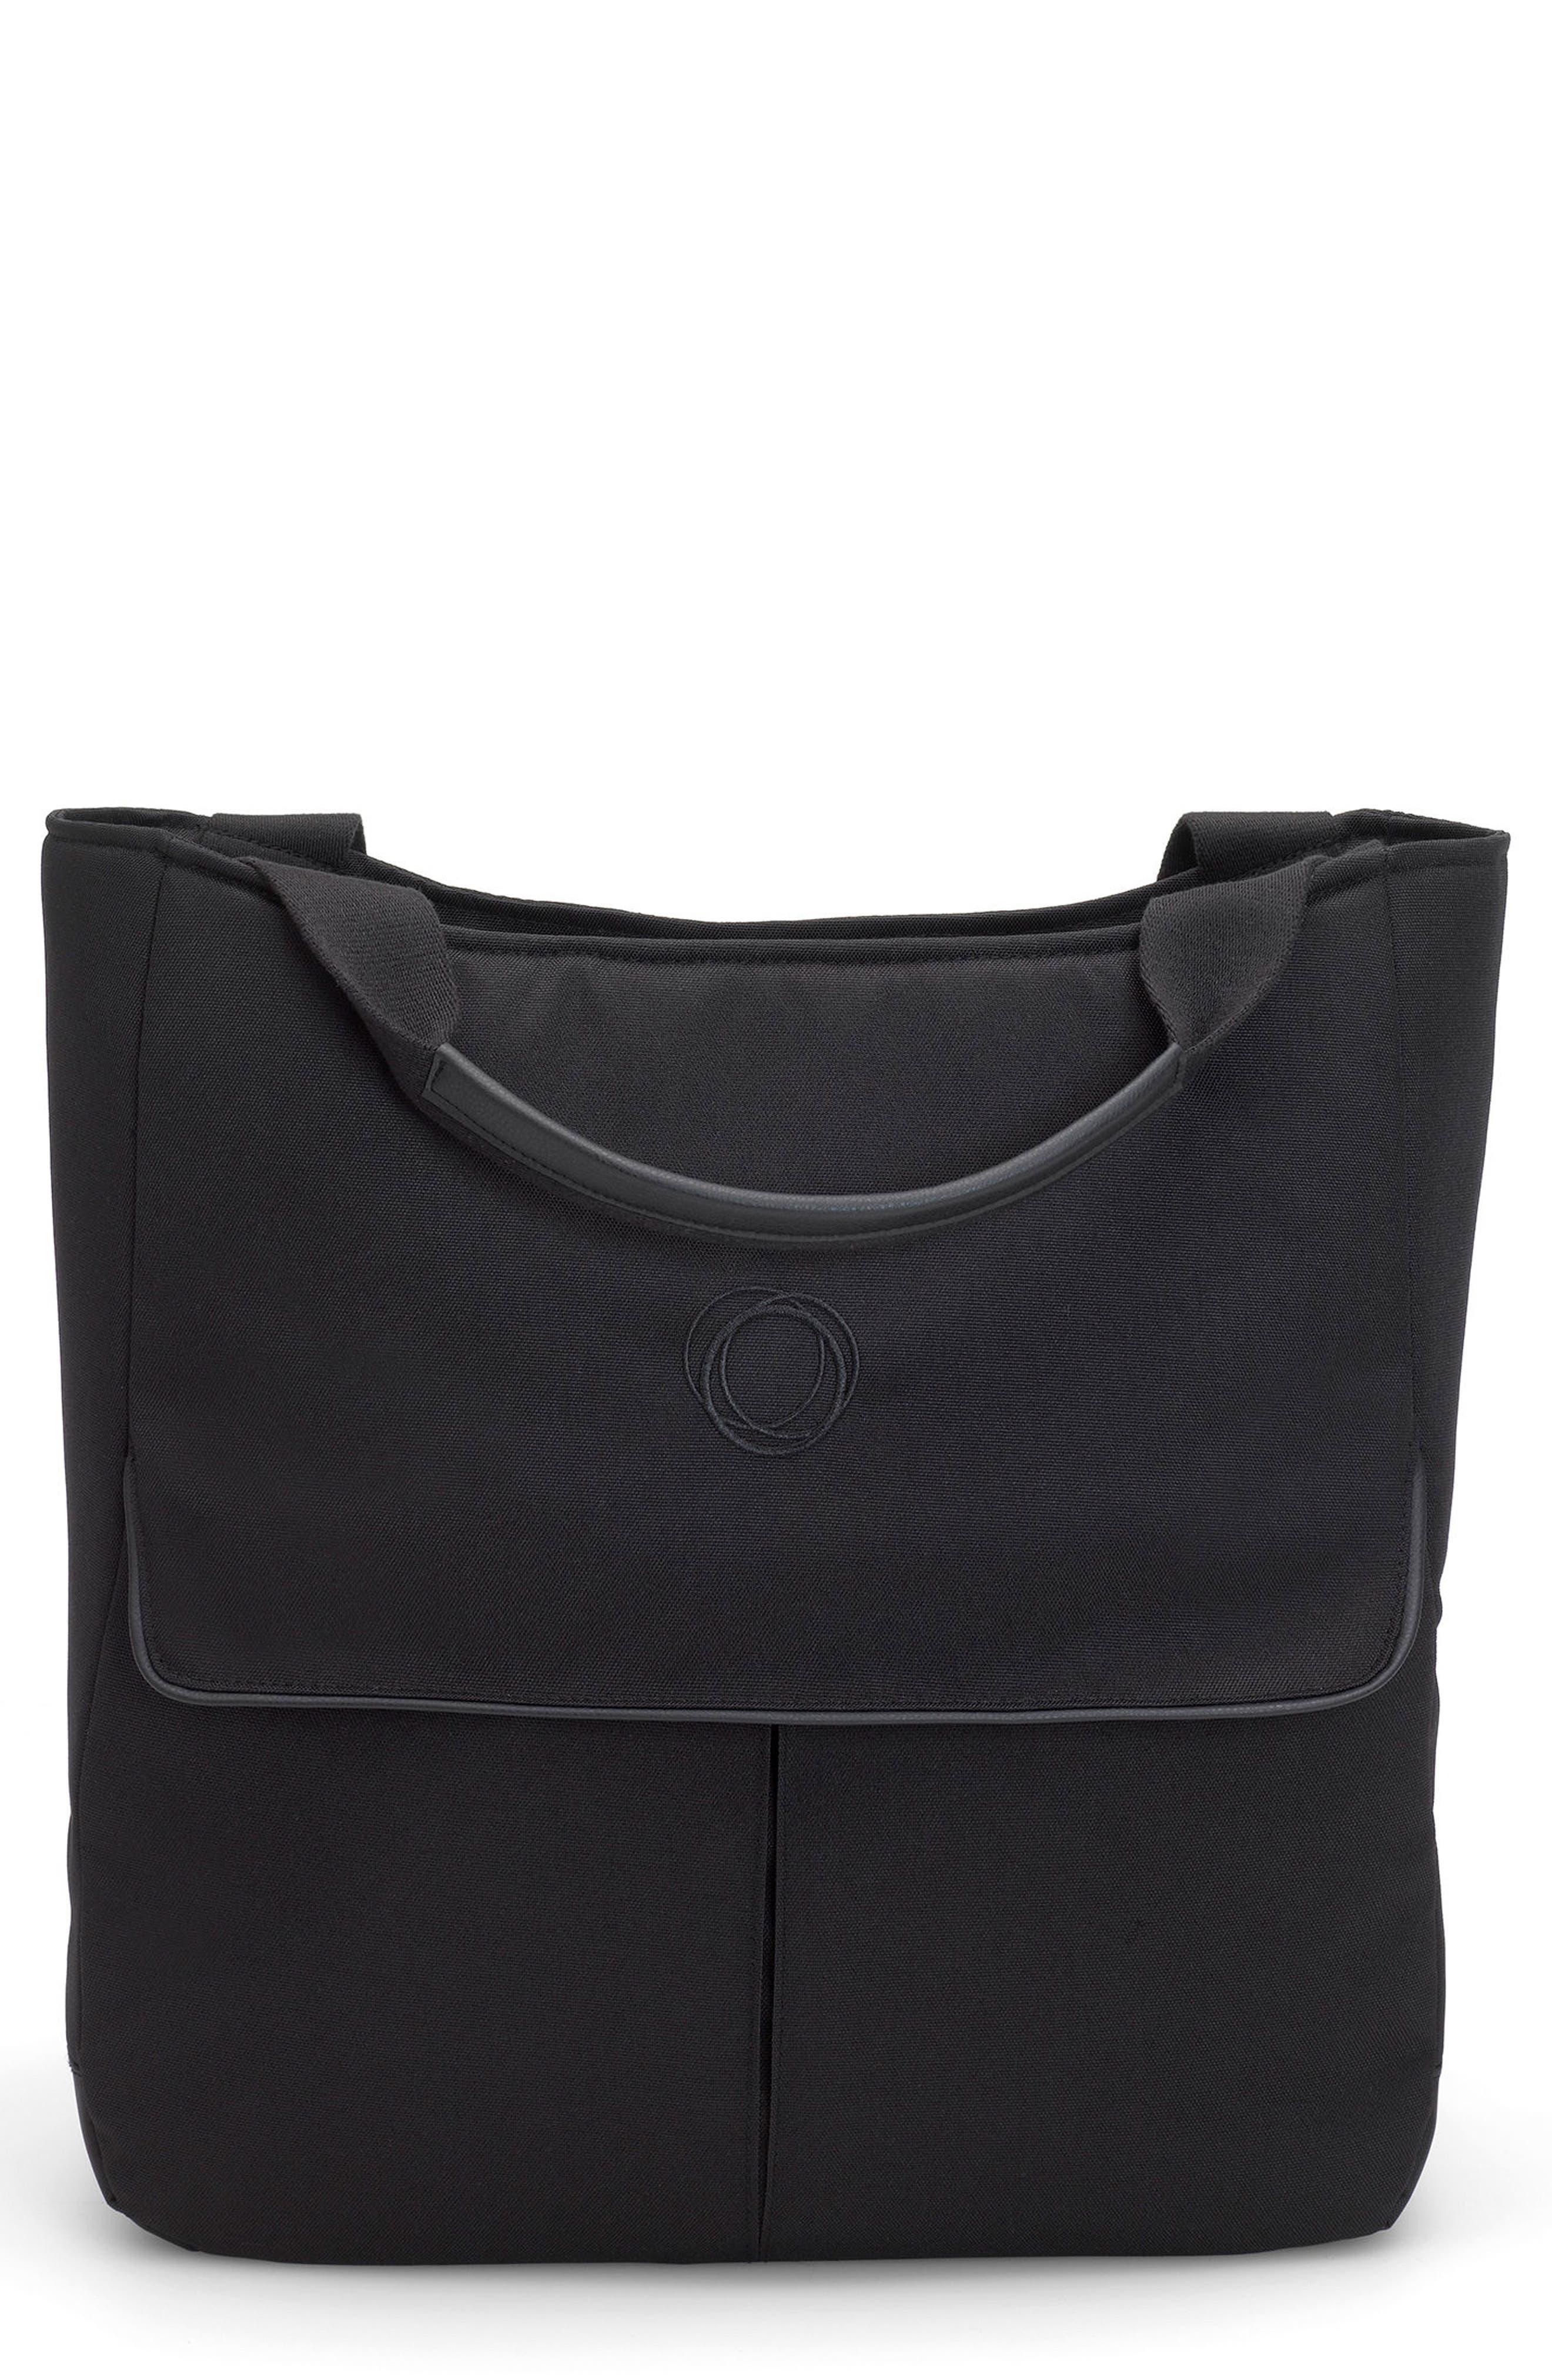 Mammoth Bee Stroller Organizer Bag,                             Main thumbnail 1, color,                             BLACK